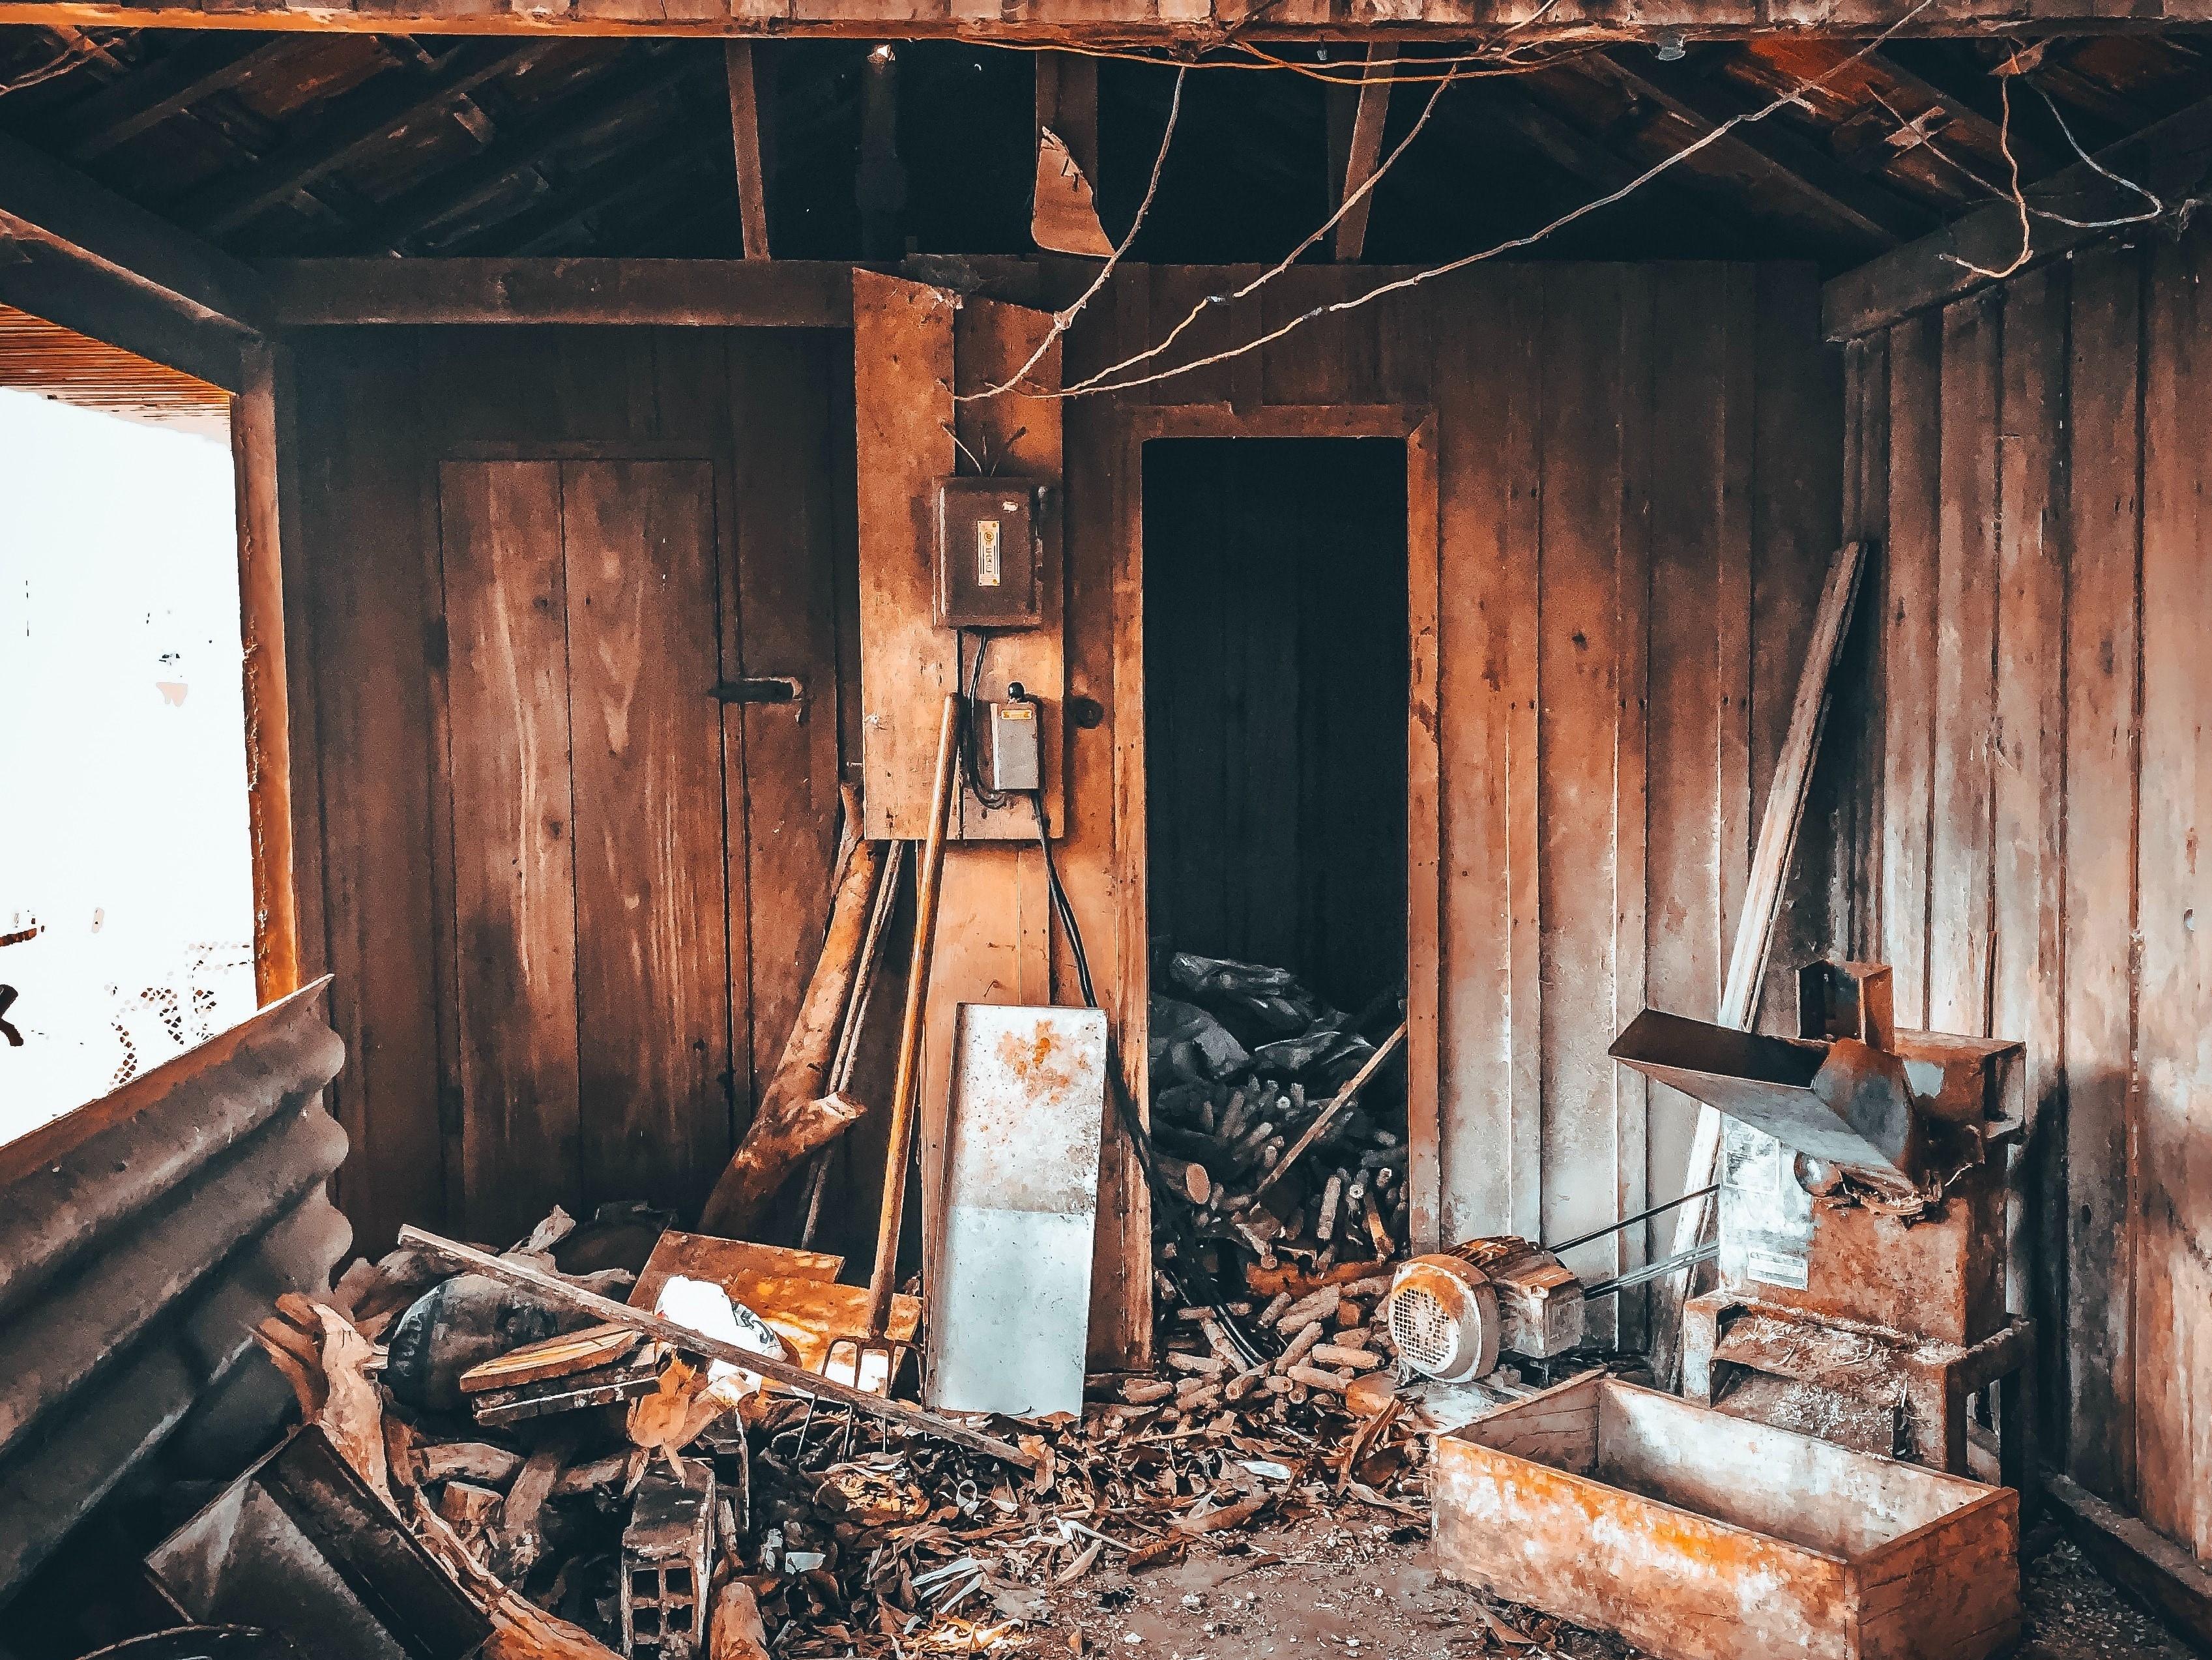 dabandoned-broken-building284205